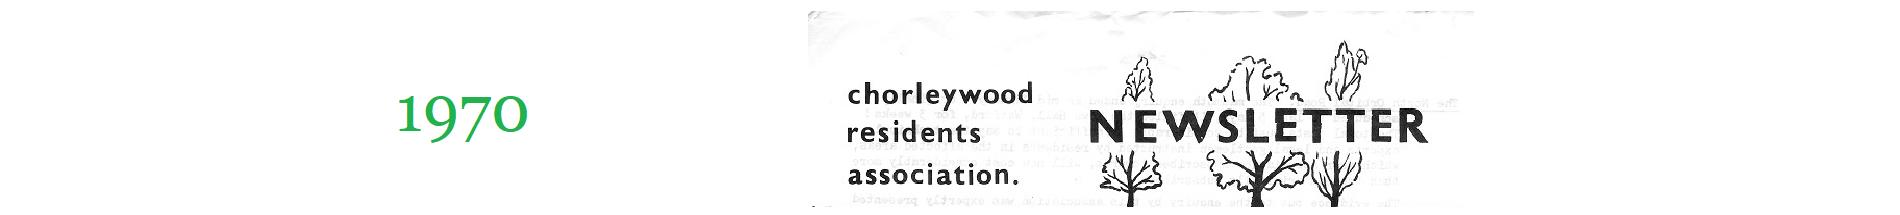 Chorleywood 1970